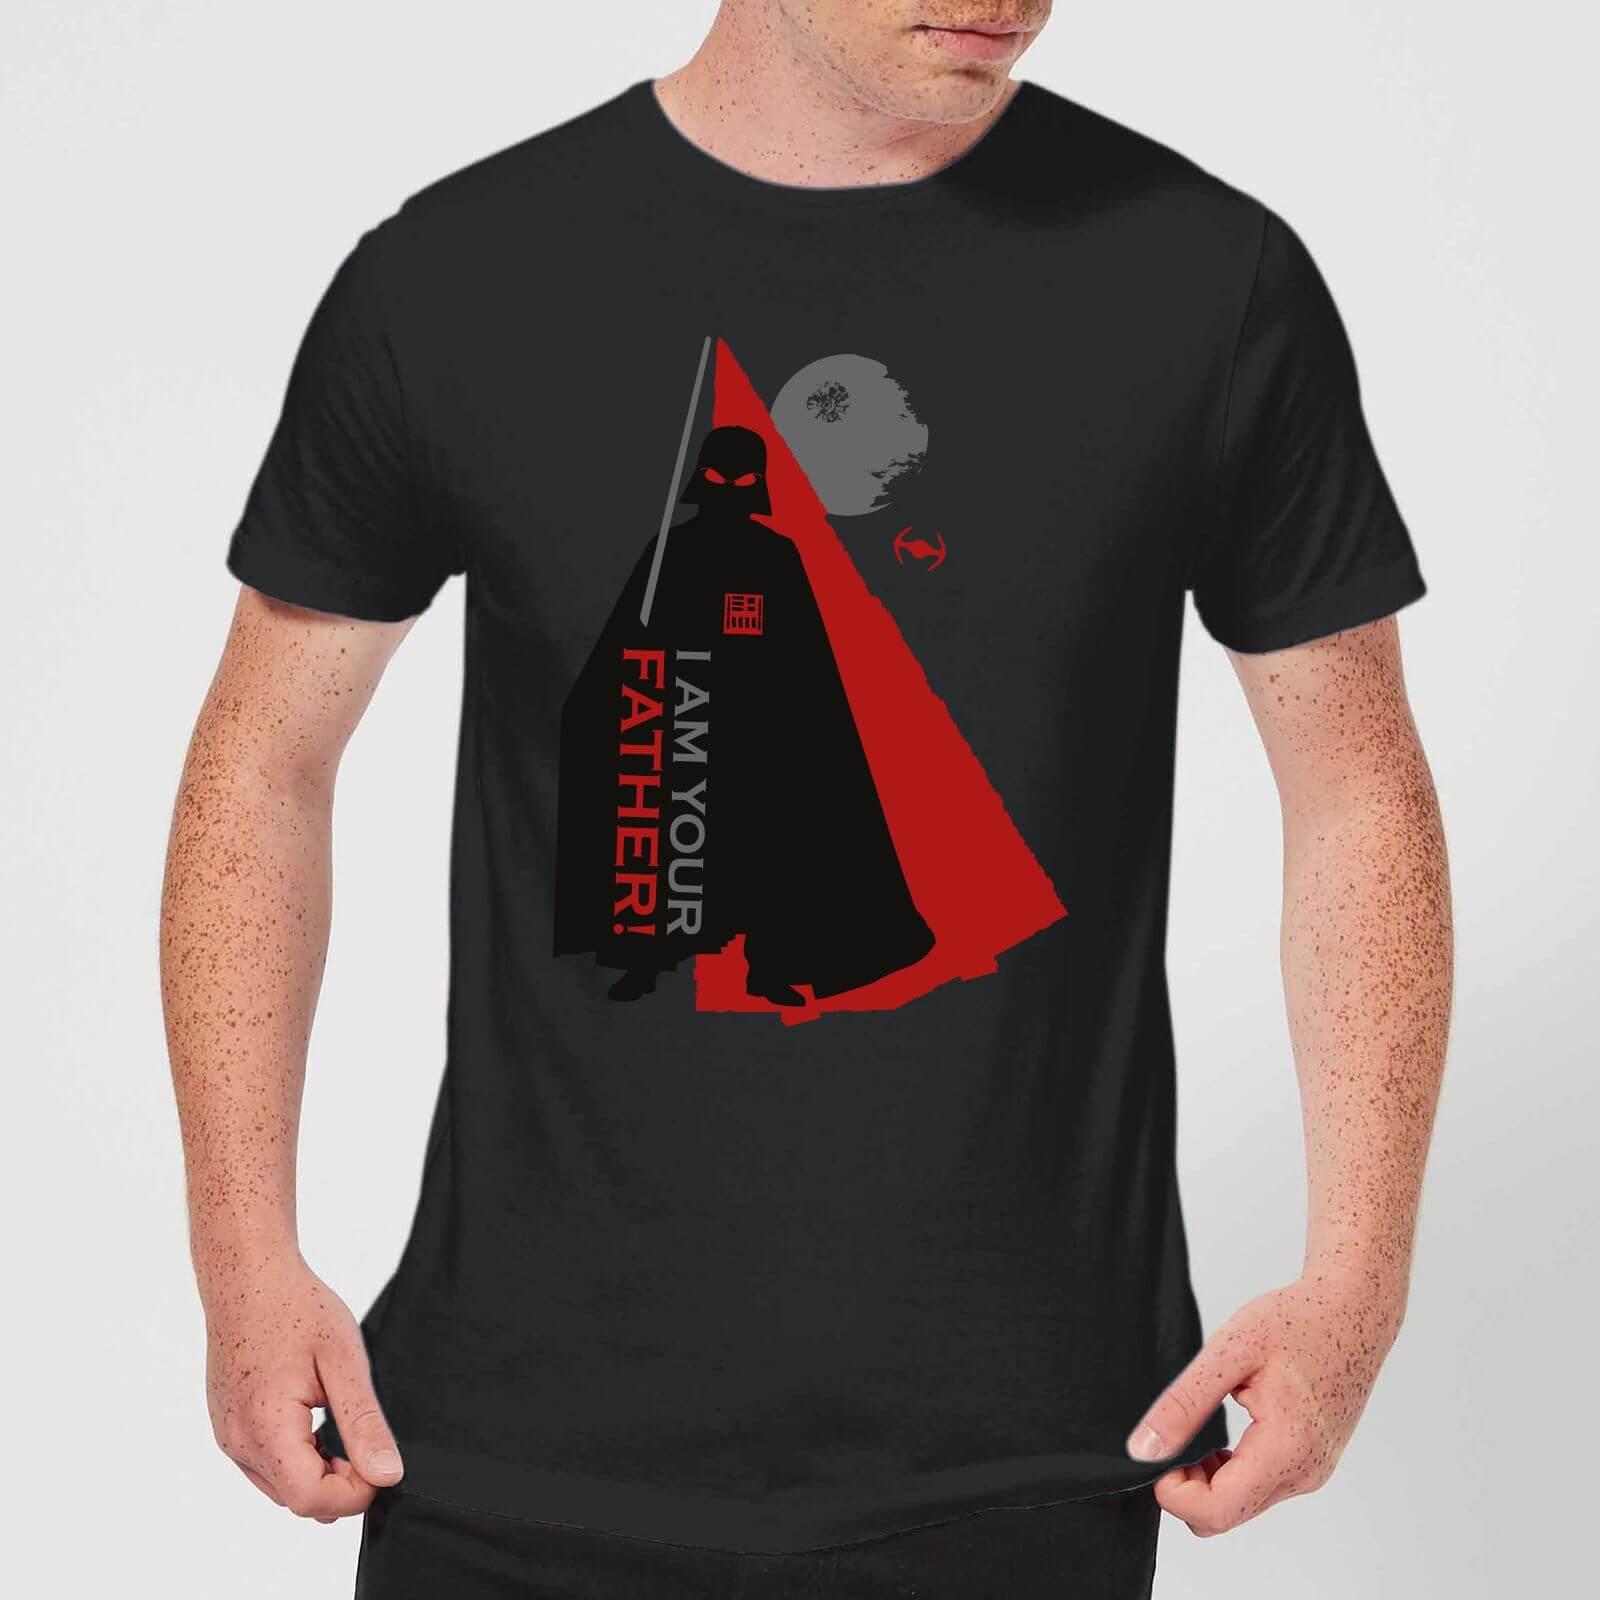 OfferteWeb.click 39-t-shirt-star-wars-darth-vader-i-am-your-father-dark-side